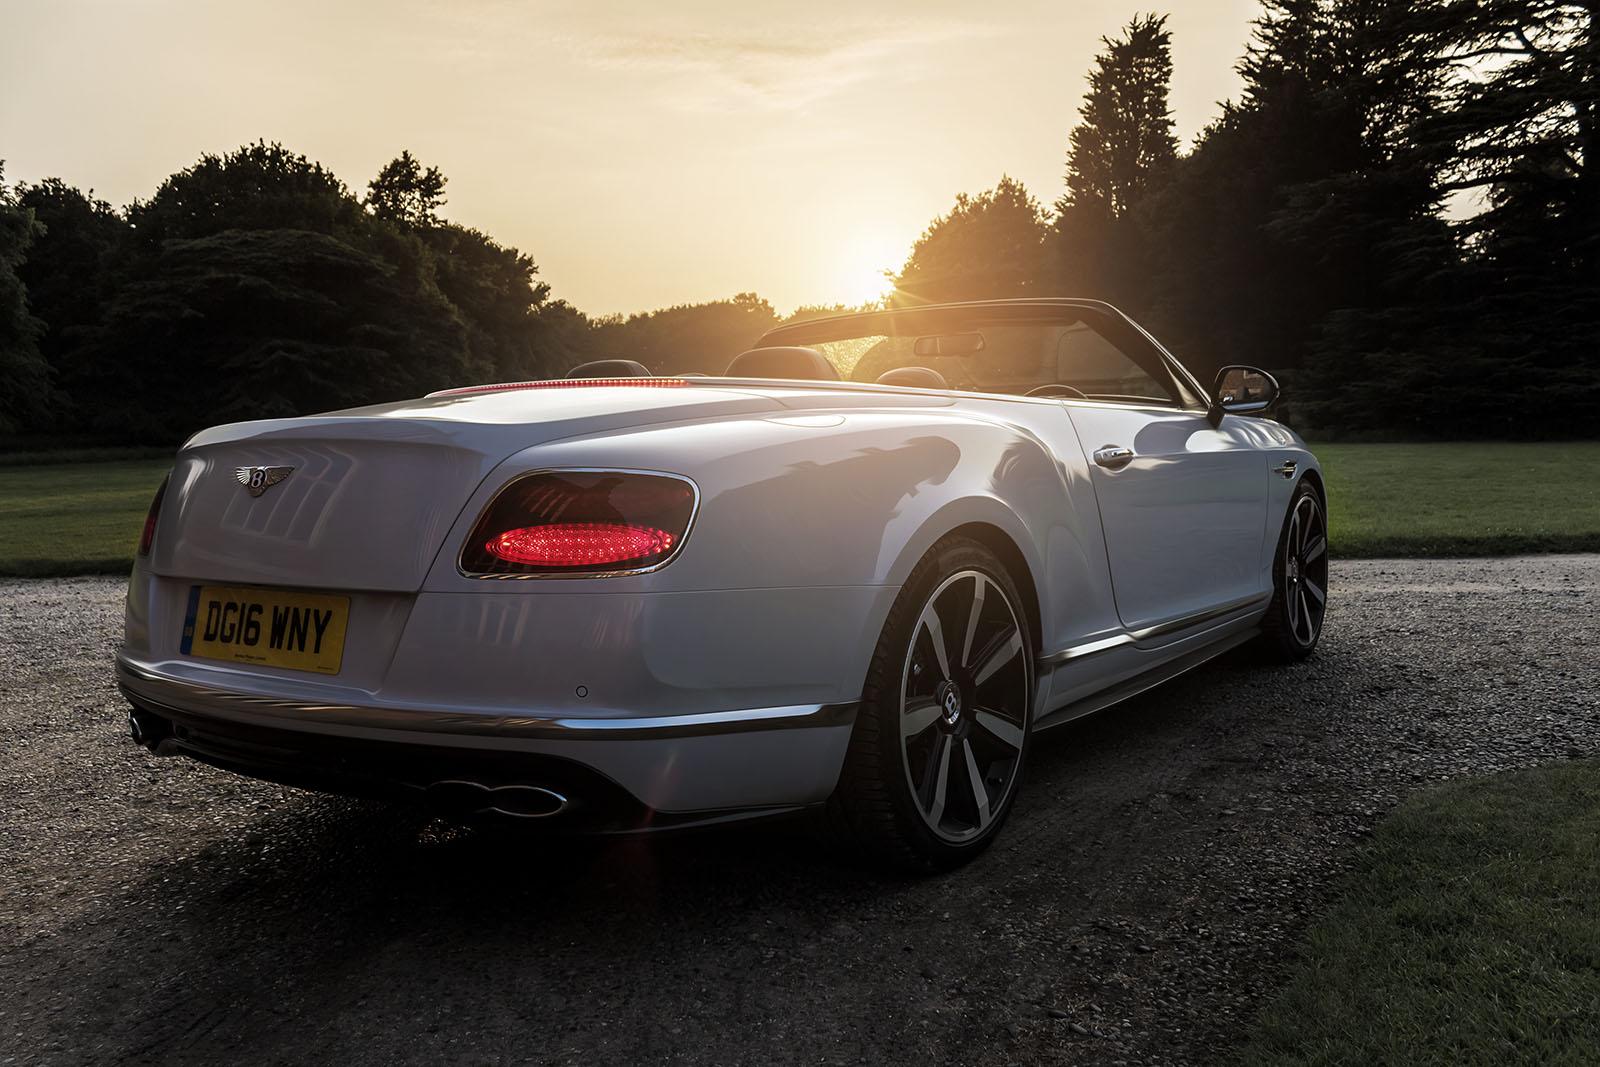 Top Down in The Bentley GTC V8S 7